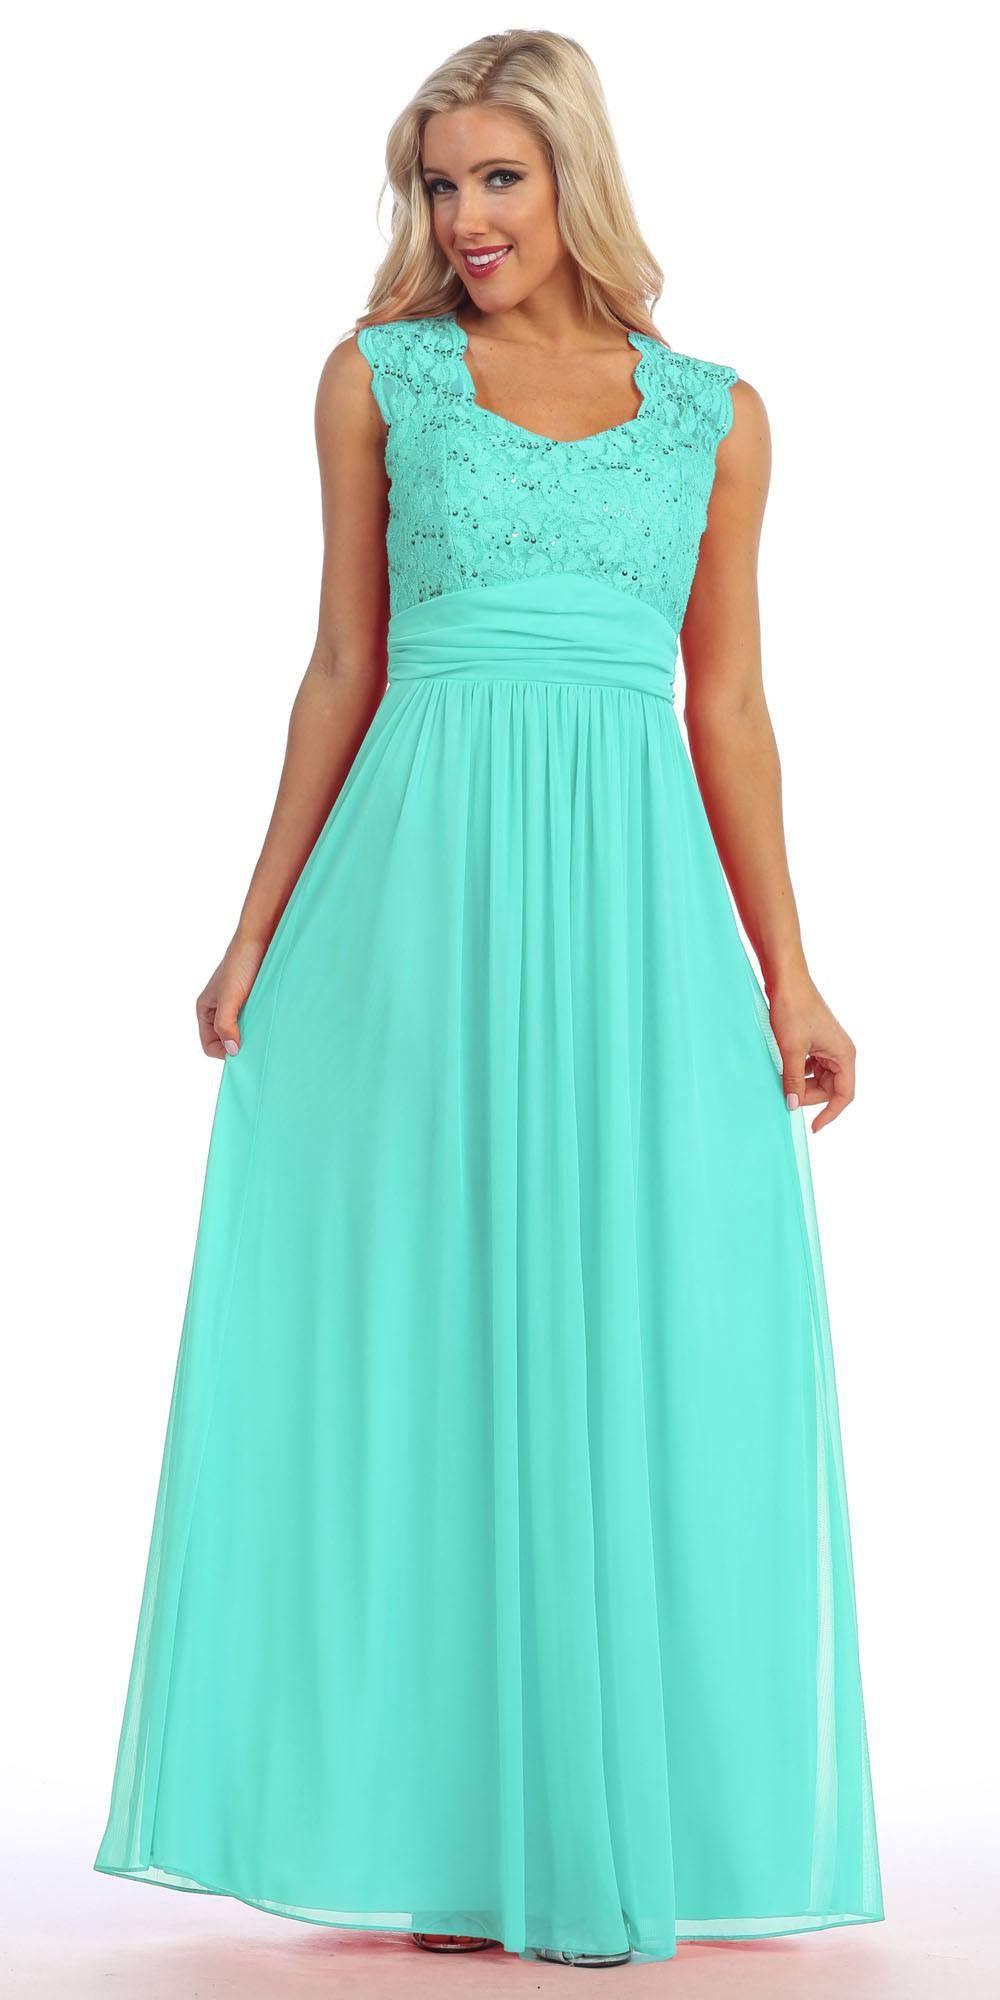 Ivory Lace Bodice A-Line Long Semi Formal Dress Queen Anne Neckline ...